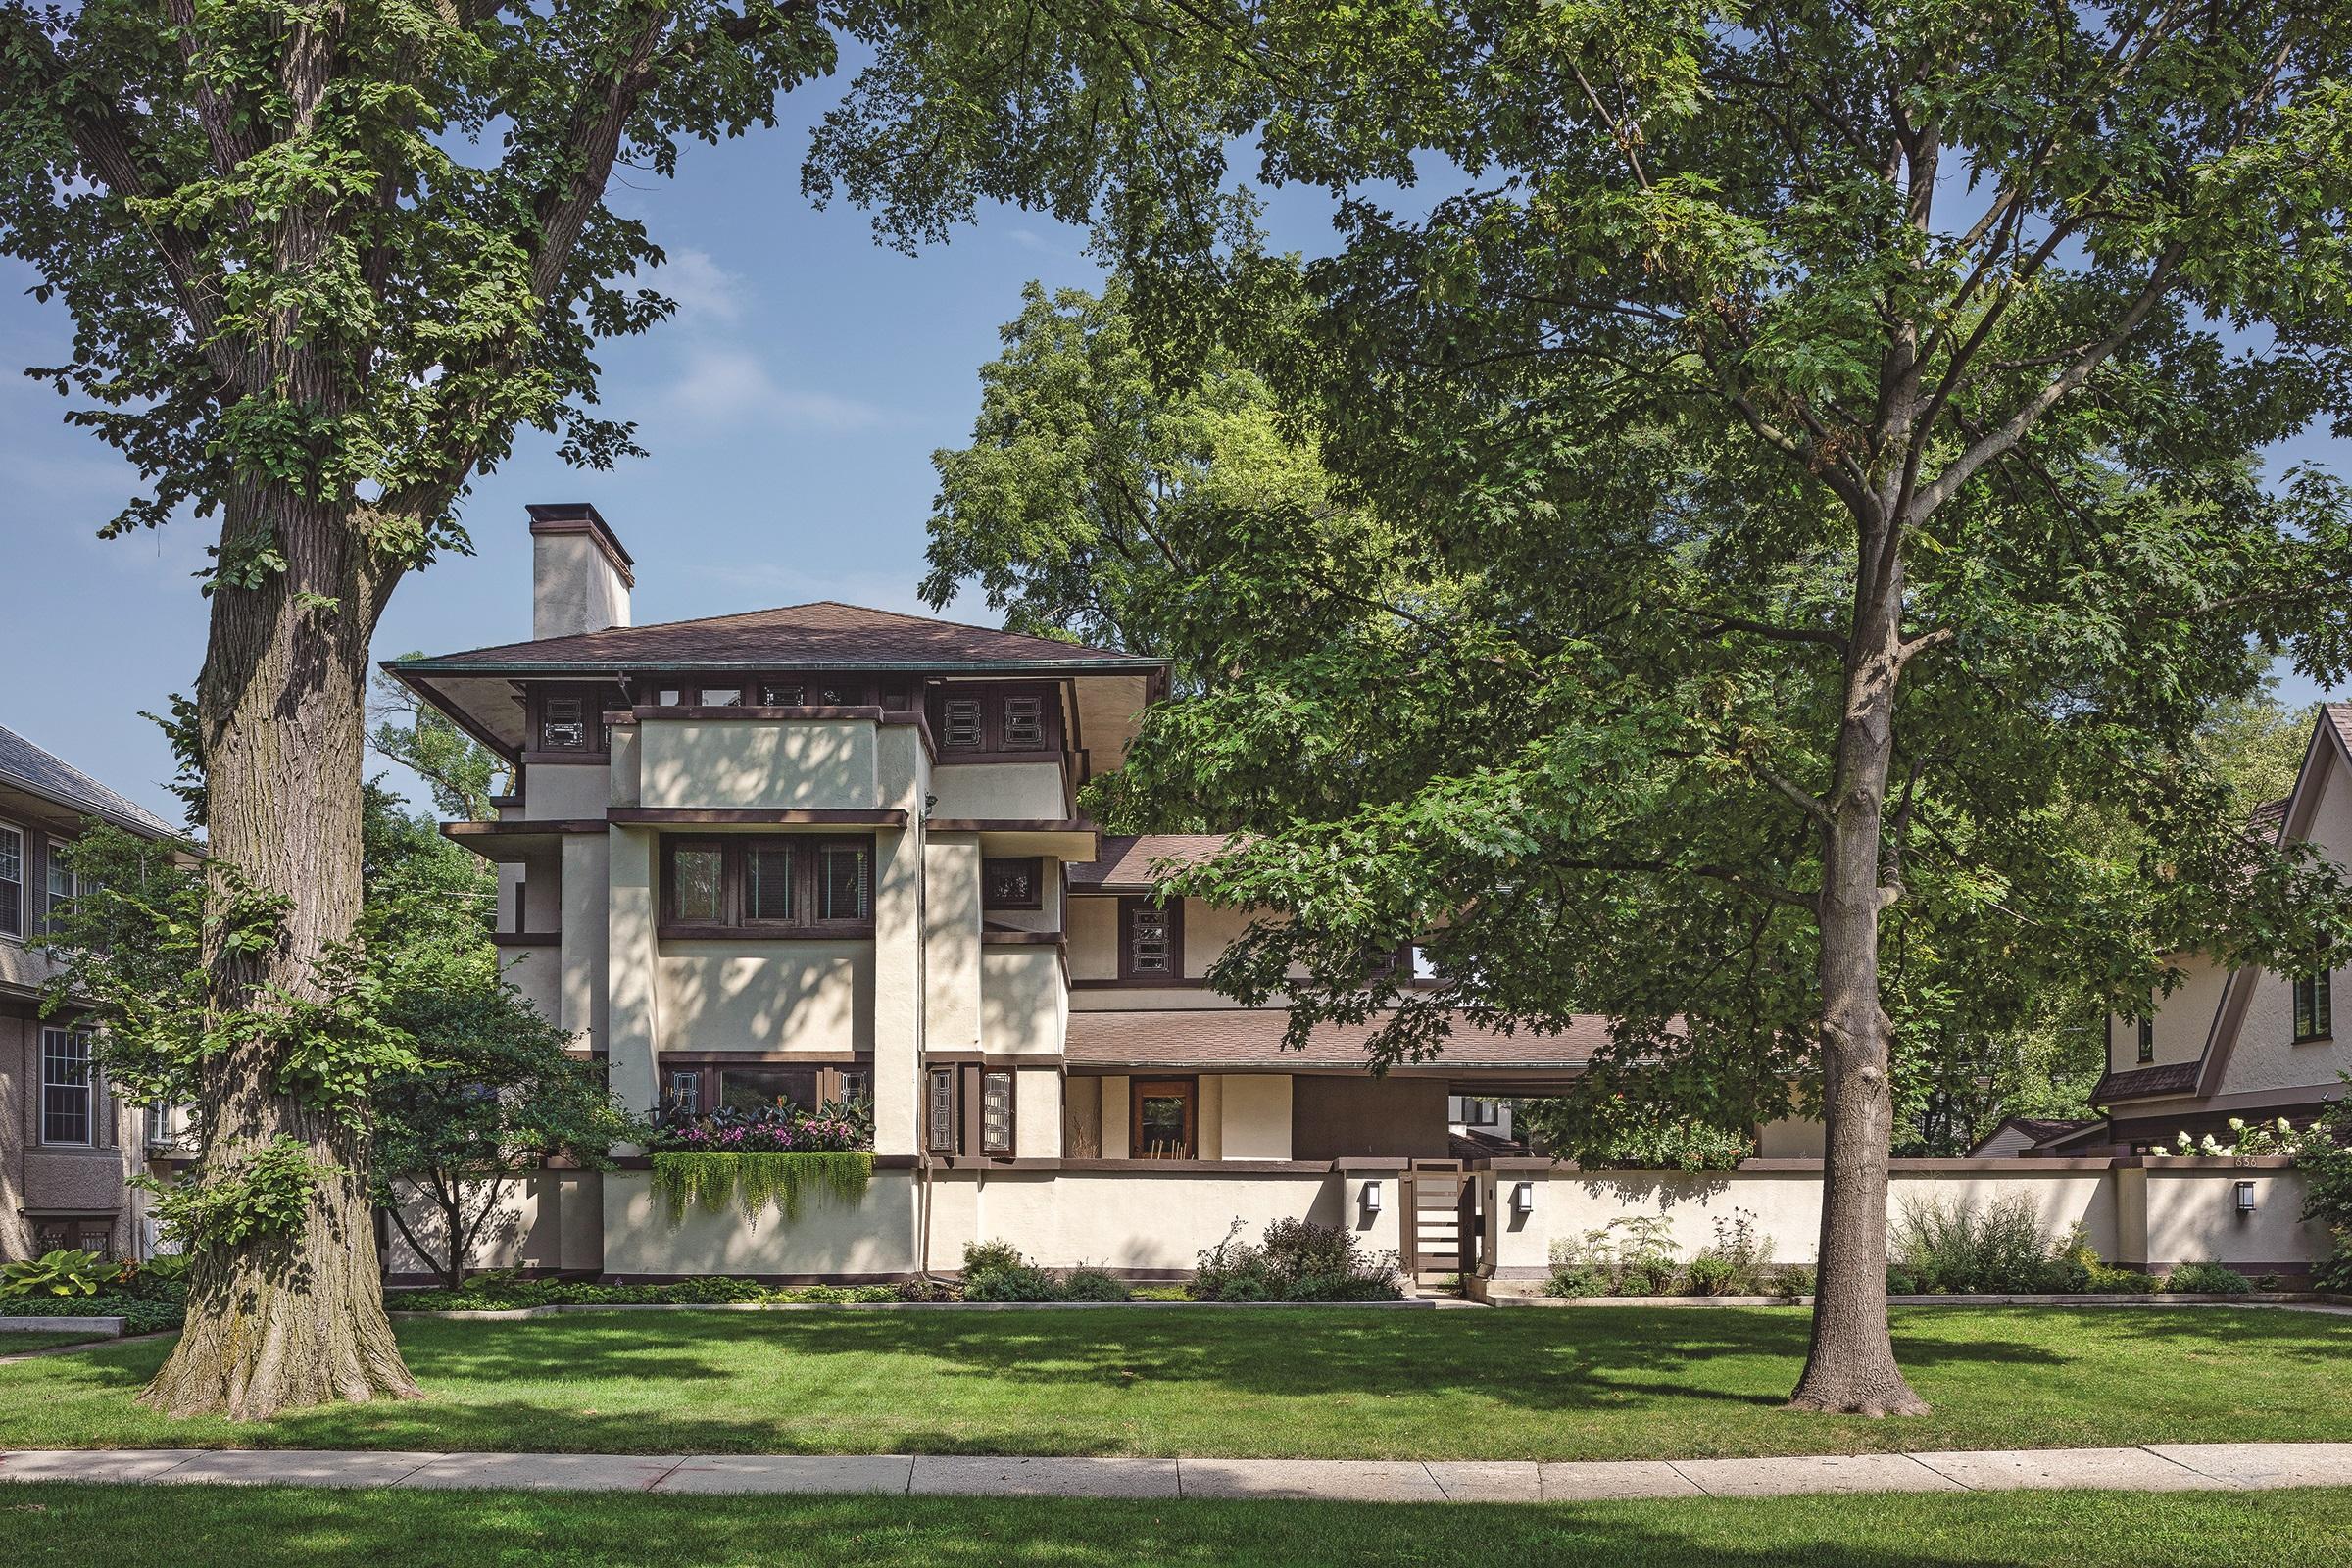 William E. Martin House (Frank Lloyd Wright, 1903) Credit: Courtesy of Frank Lloyd Wright Trust. Photographer: James Caulfield